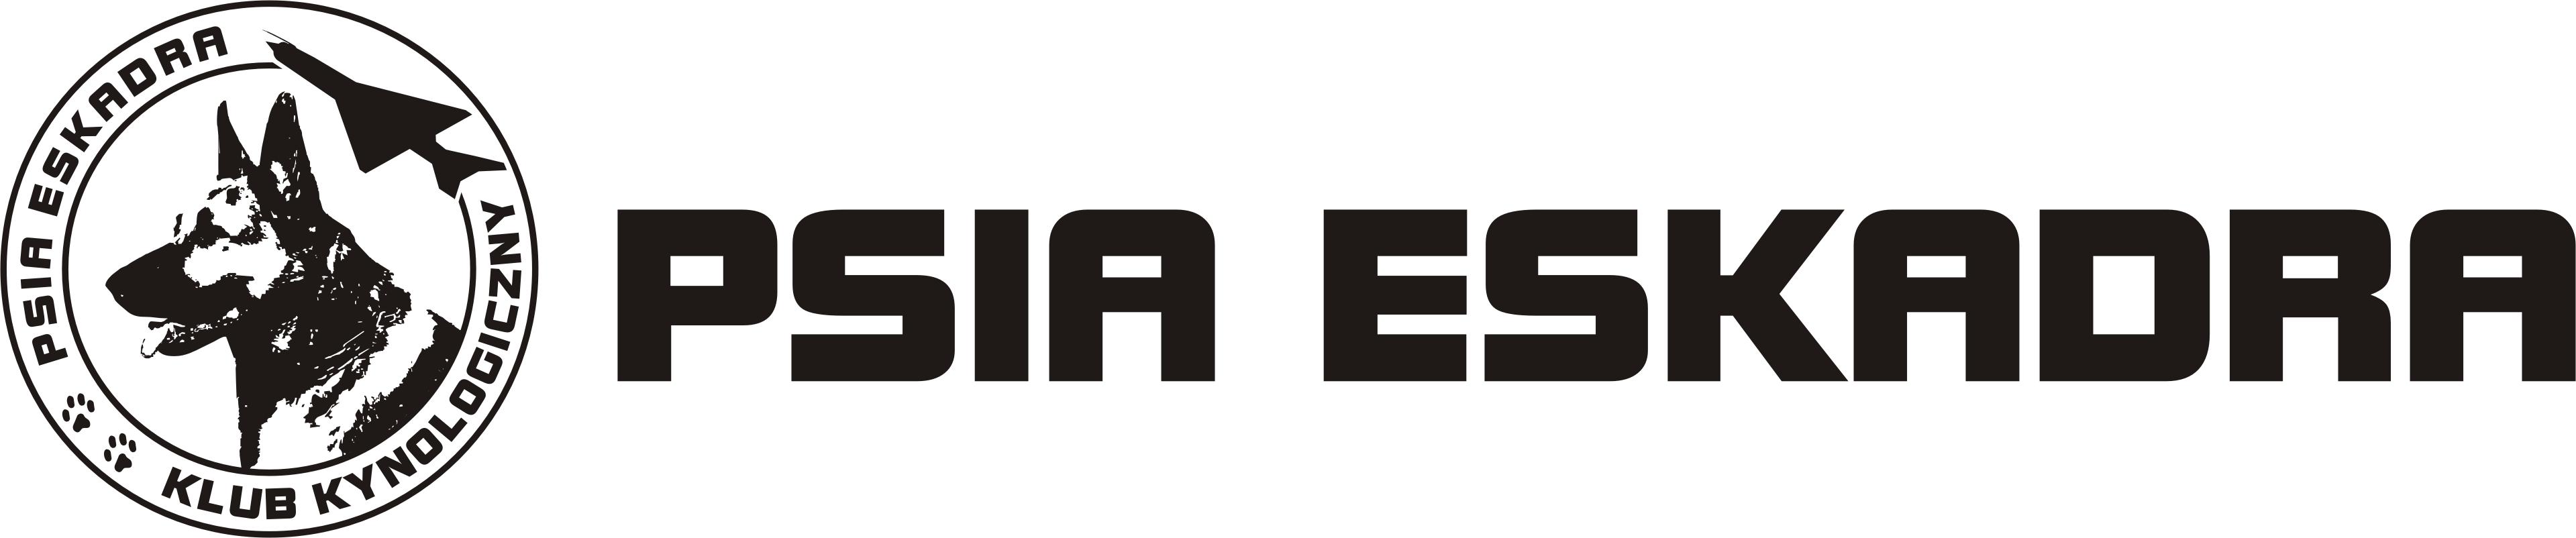 logo_PE_fb